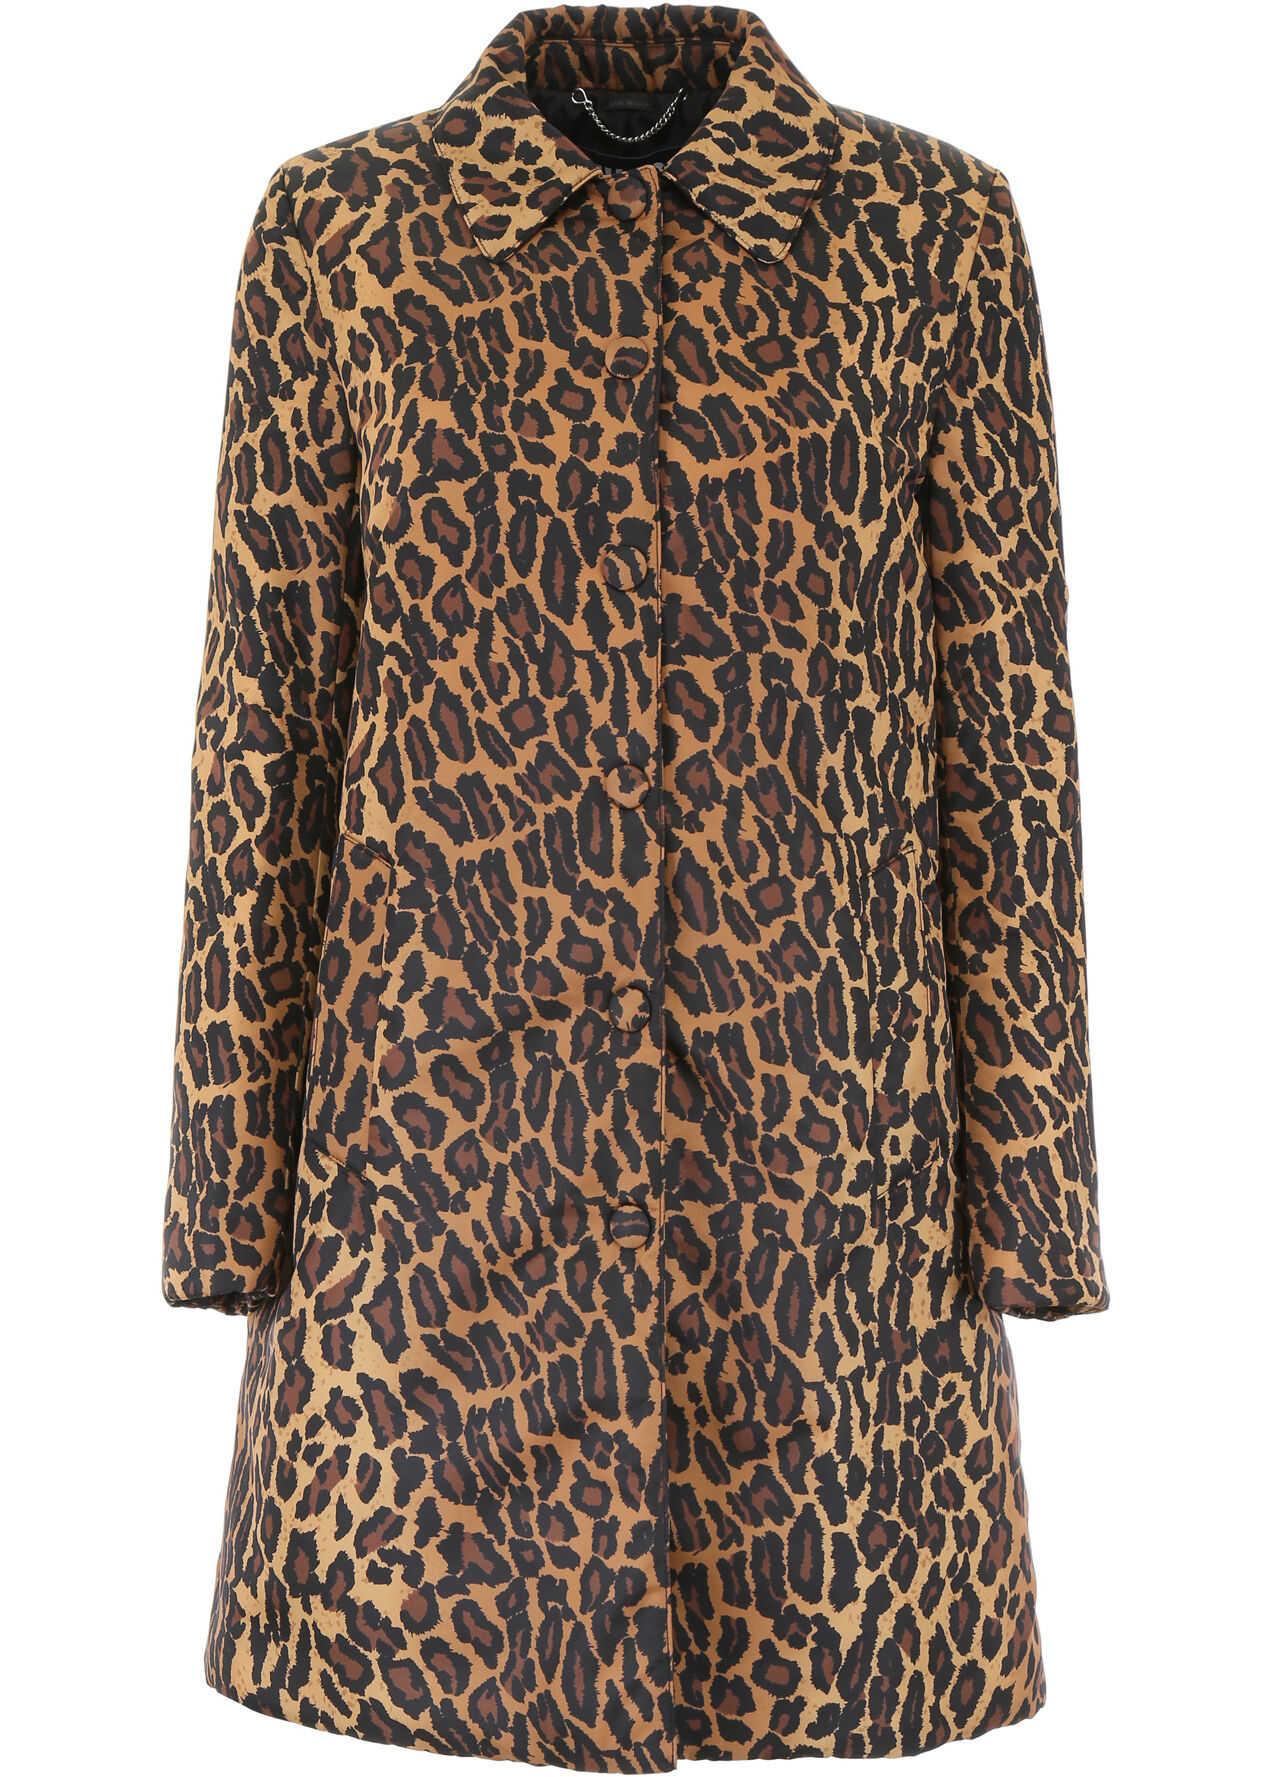 Miu Miu Leopard-Printed Coat KAKI